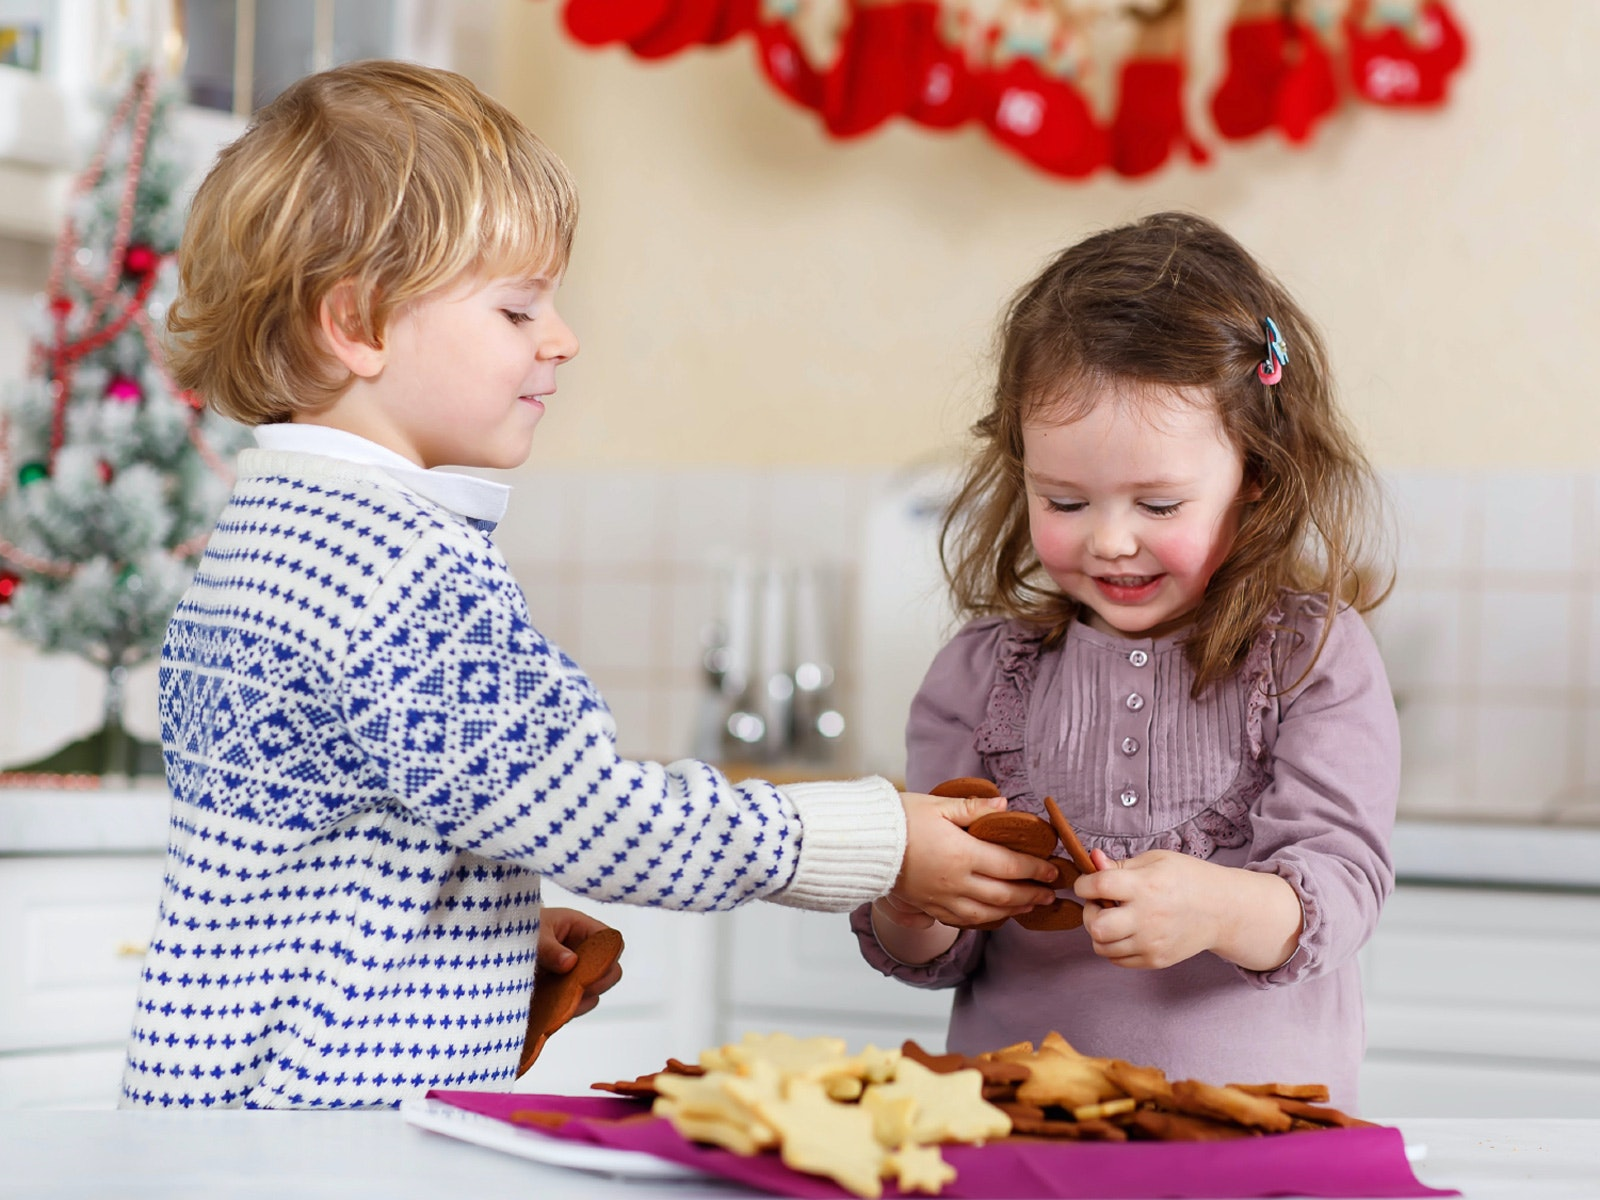 No l des id es de menus sympas pour les enfants - Repas de noel enfant ...